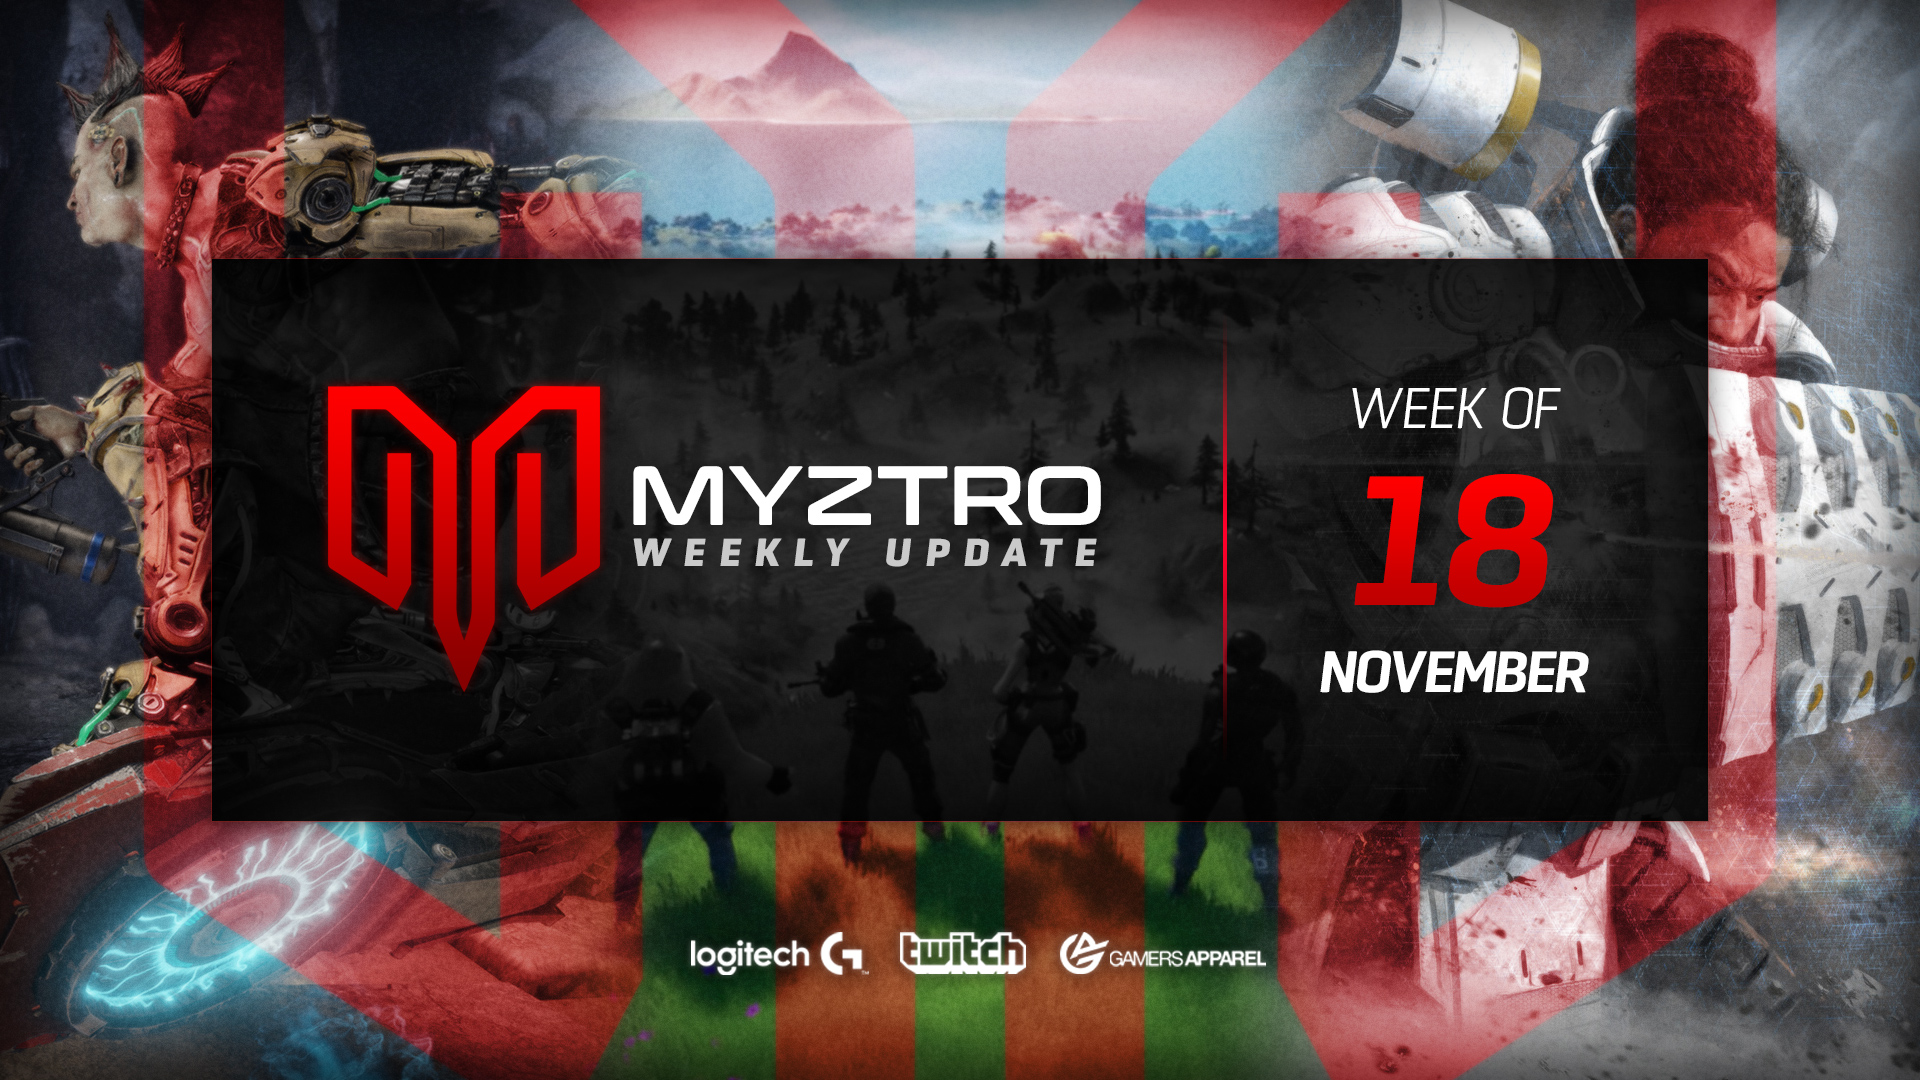 Myztro Weekly Update 7: 11/18/19